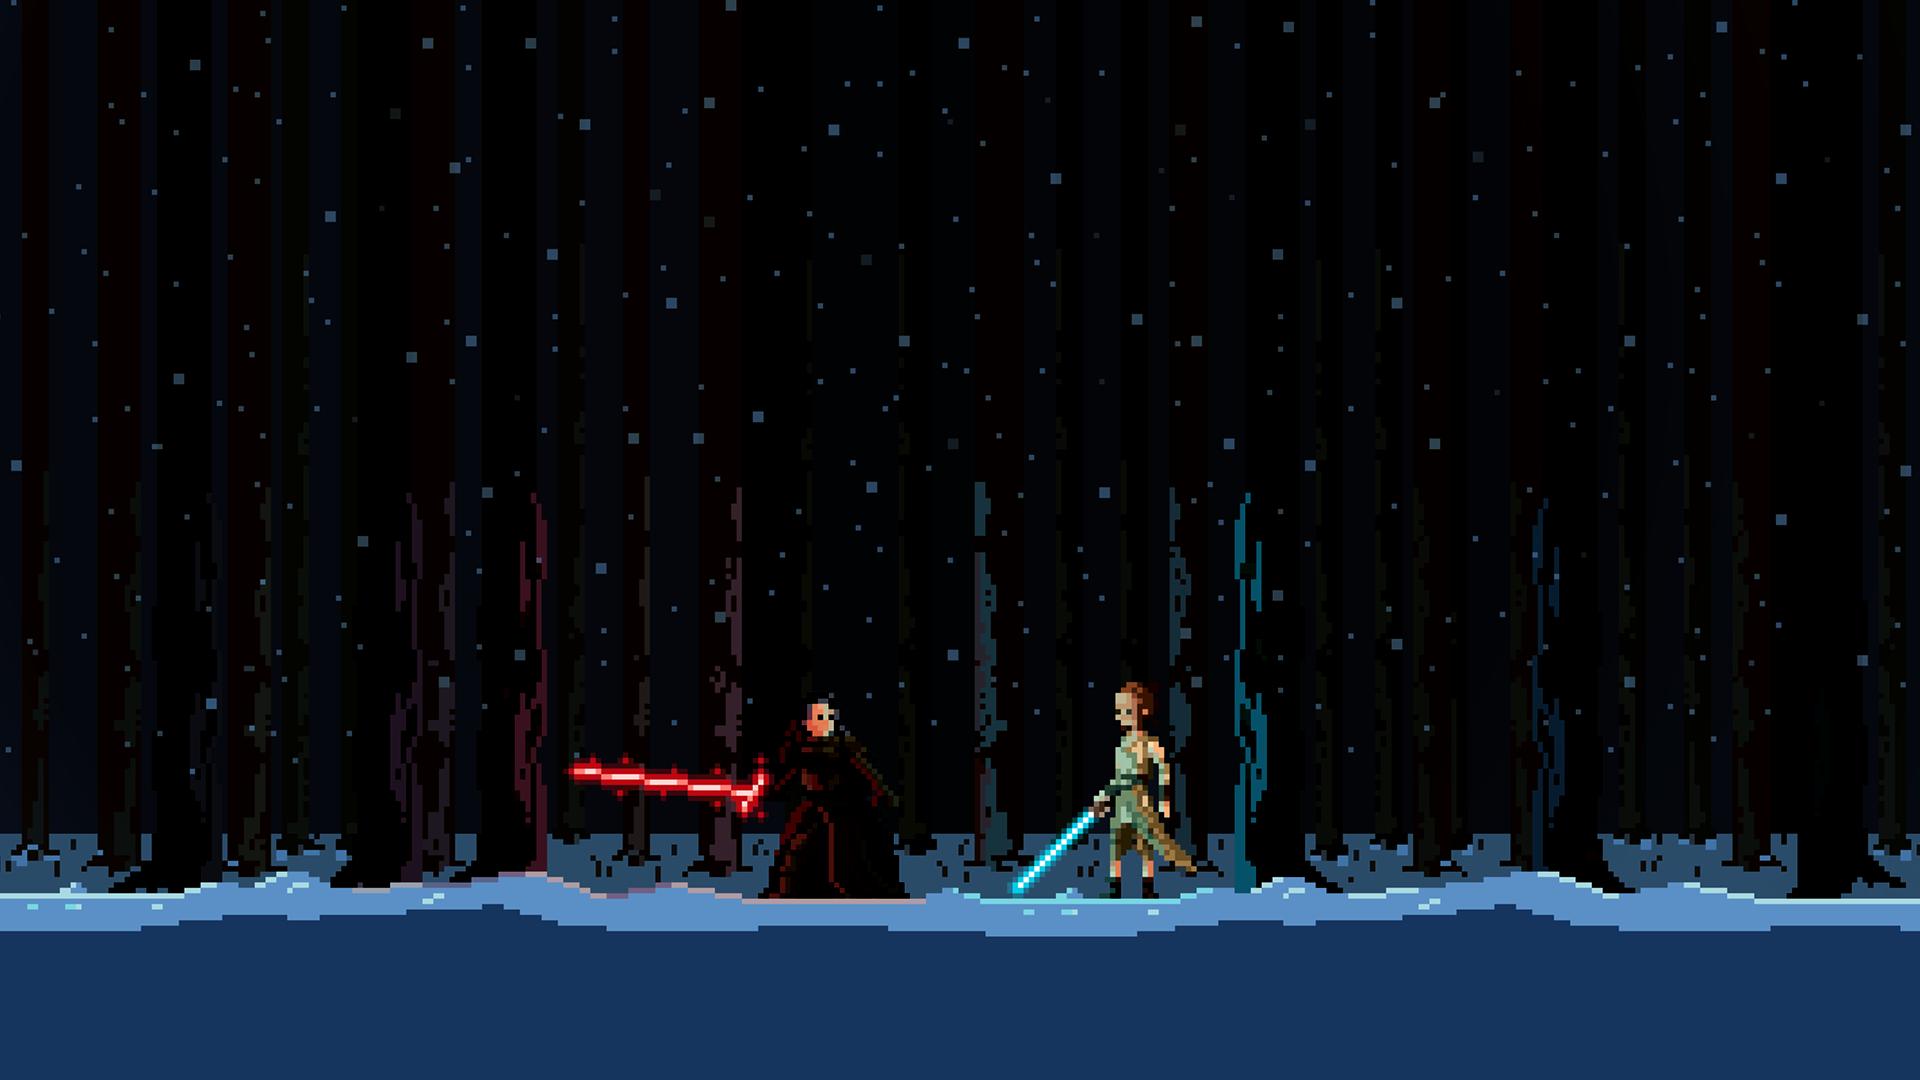 Wallpaper Desktop Star Wars Pixel Art